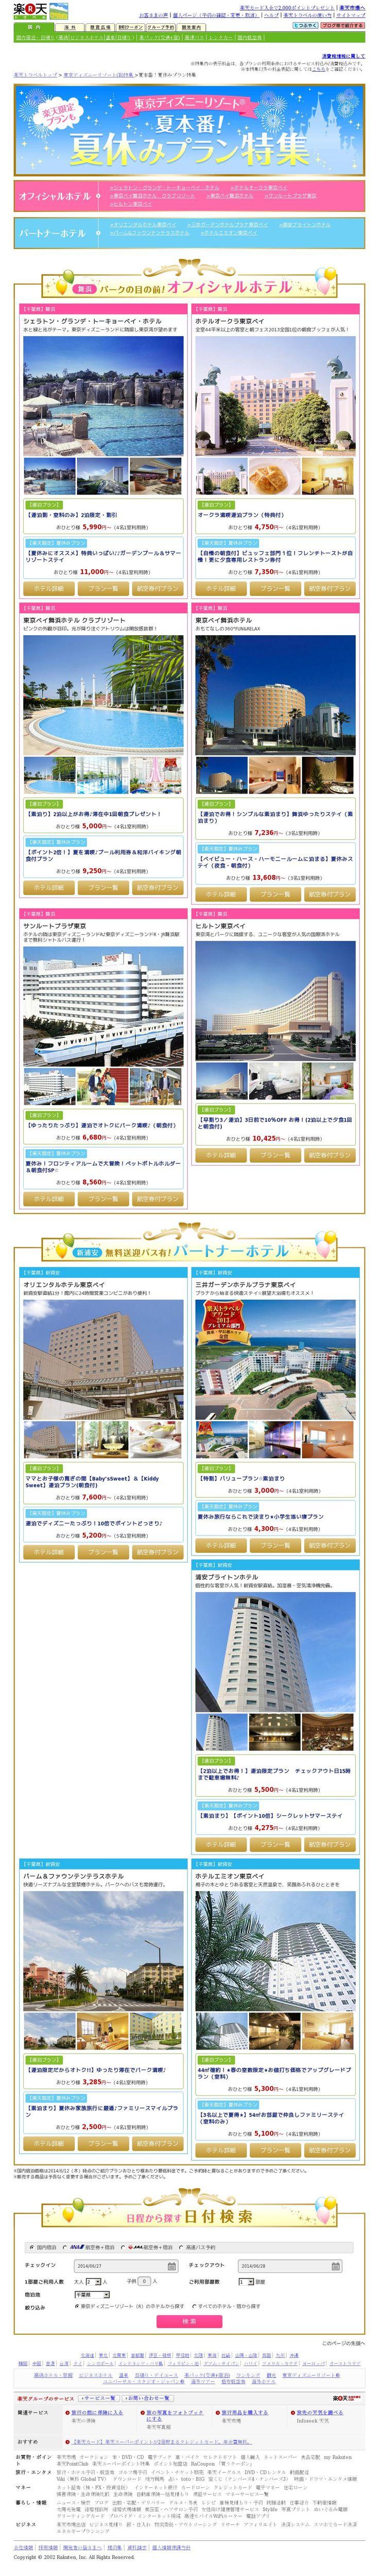 2014/5/22【D/C】【TDR】シーズン特集5月(早期夏休みorパスポート付)